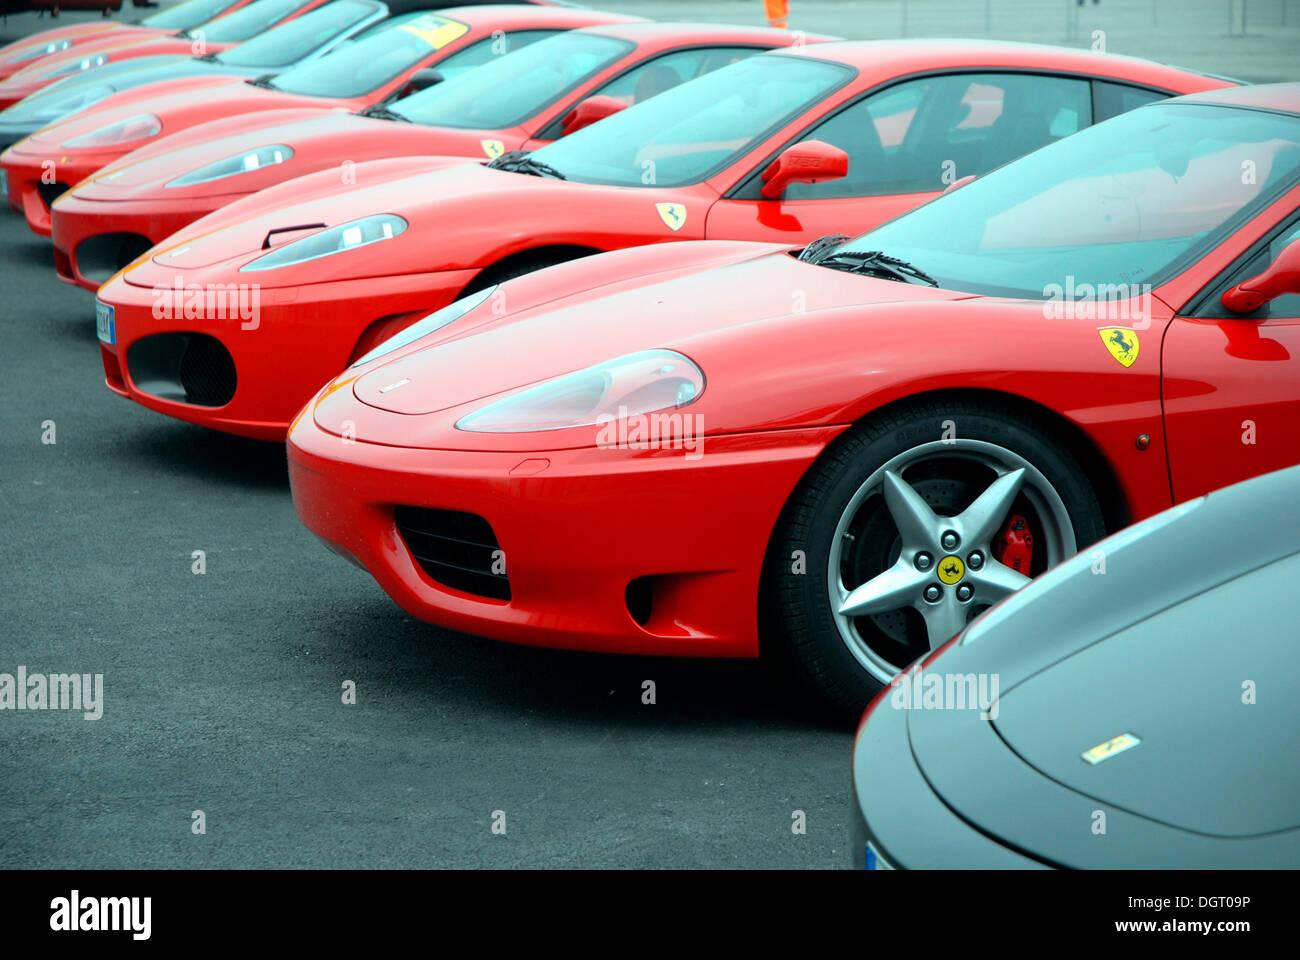 Ferrari Cars In A Car Park, Misano World Circuit, Italy, Europe   Stock